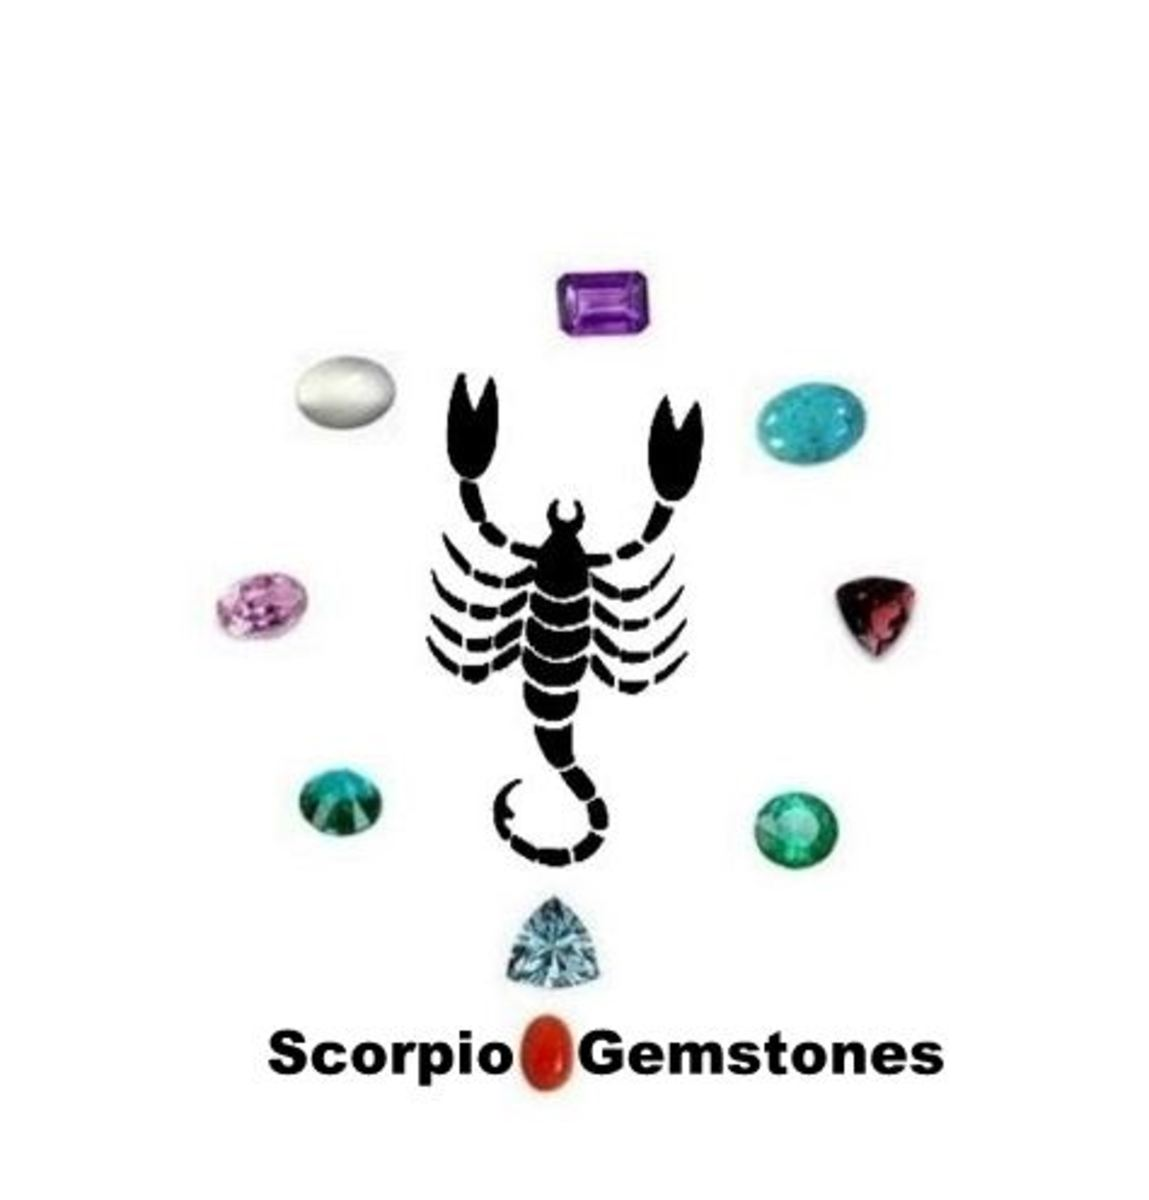 Scorpio Gemstones : Amethyst, Aquamarine, Kunzite, Garnet, Moonstone, Emerald, Dioptase, Coral and Turquoise